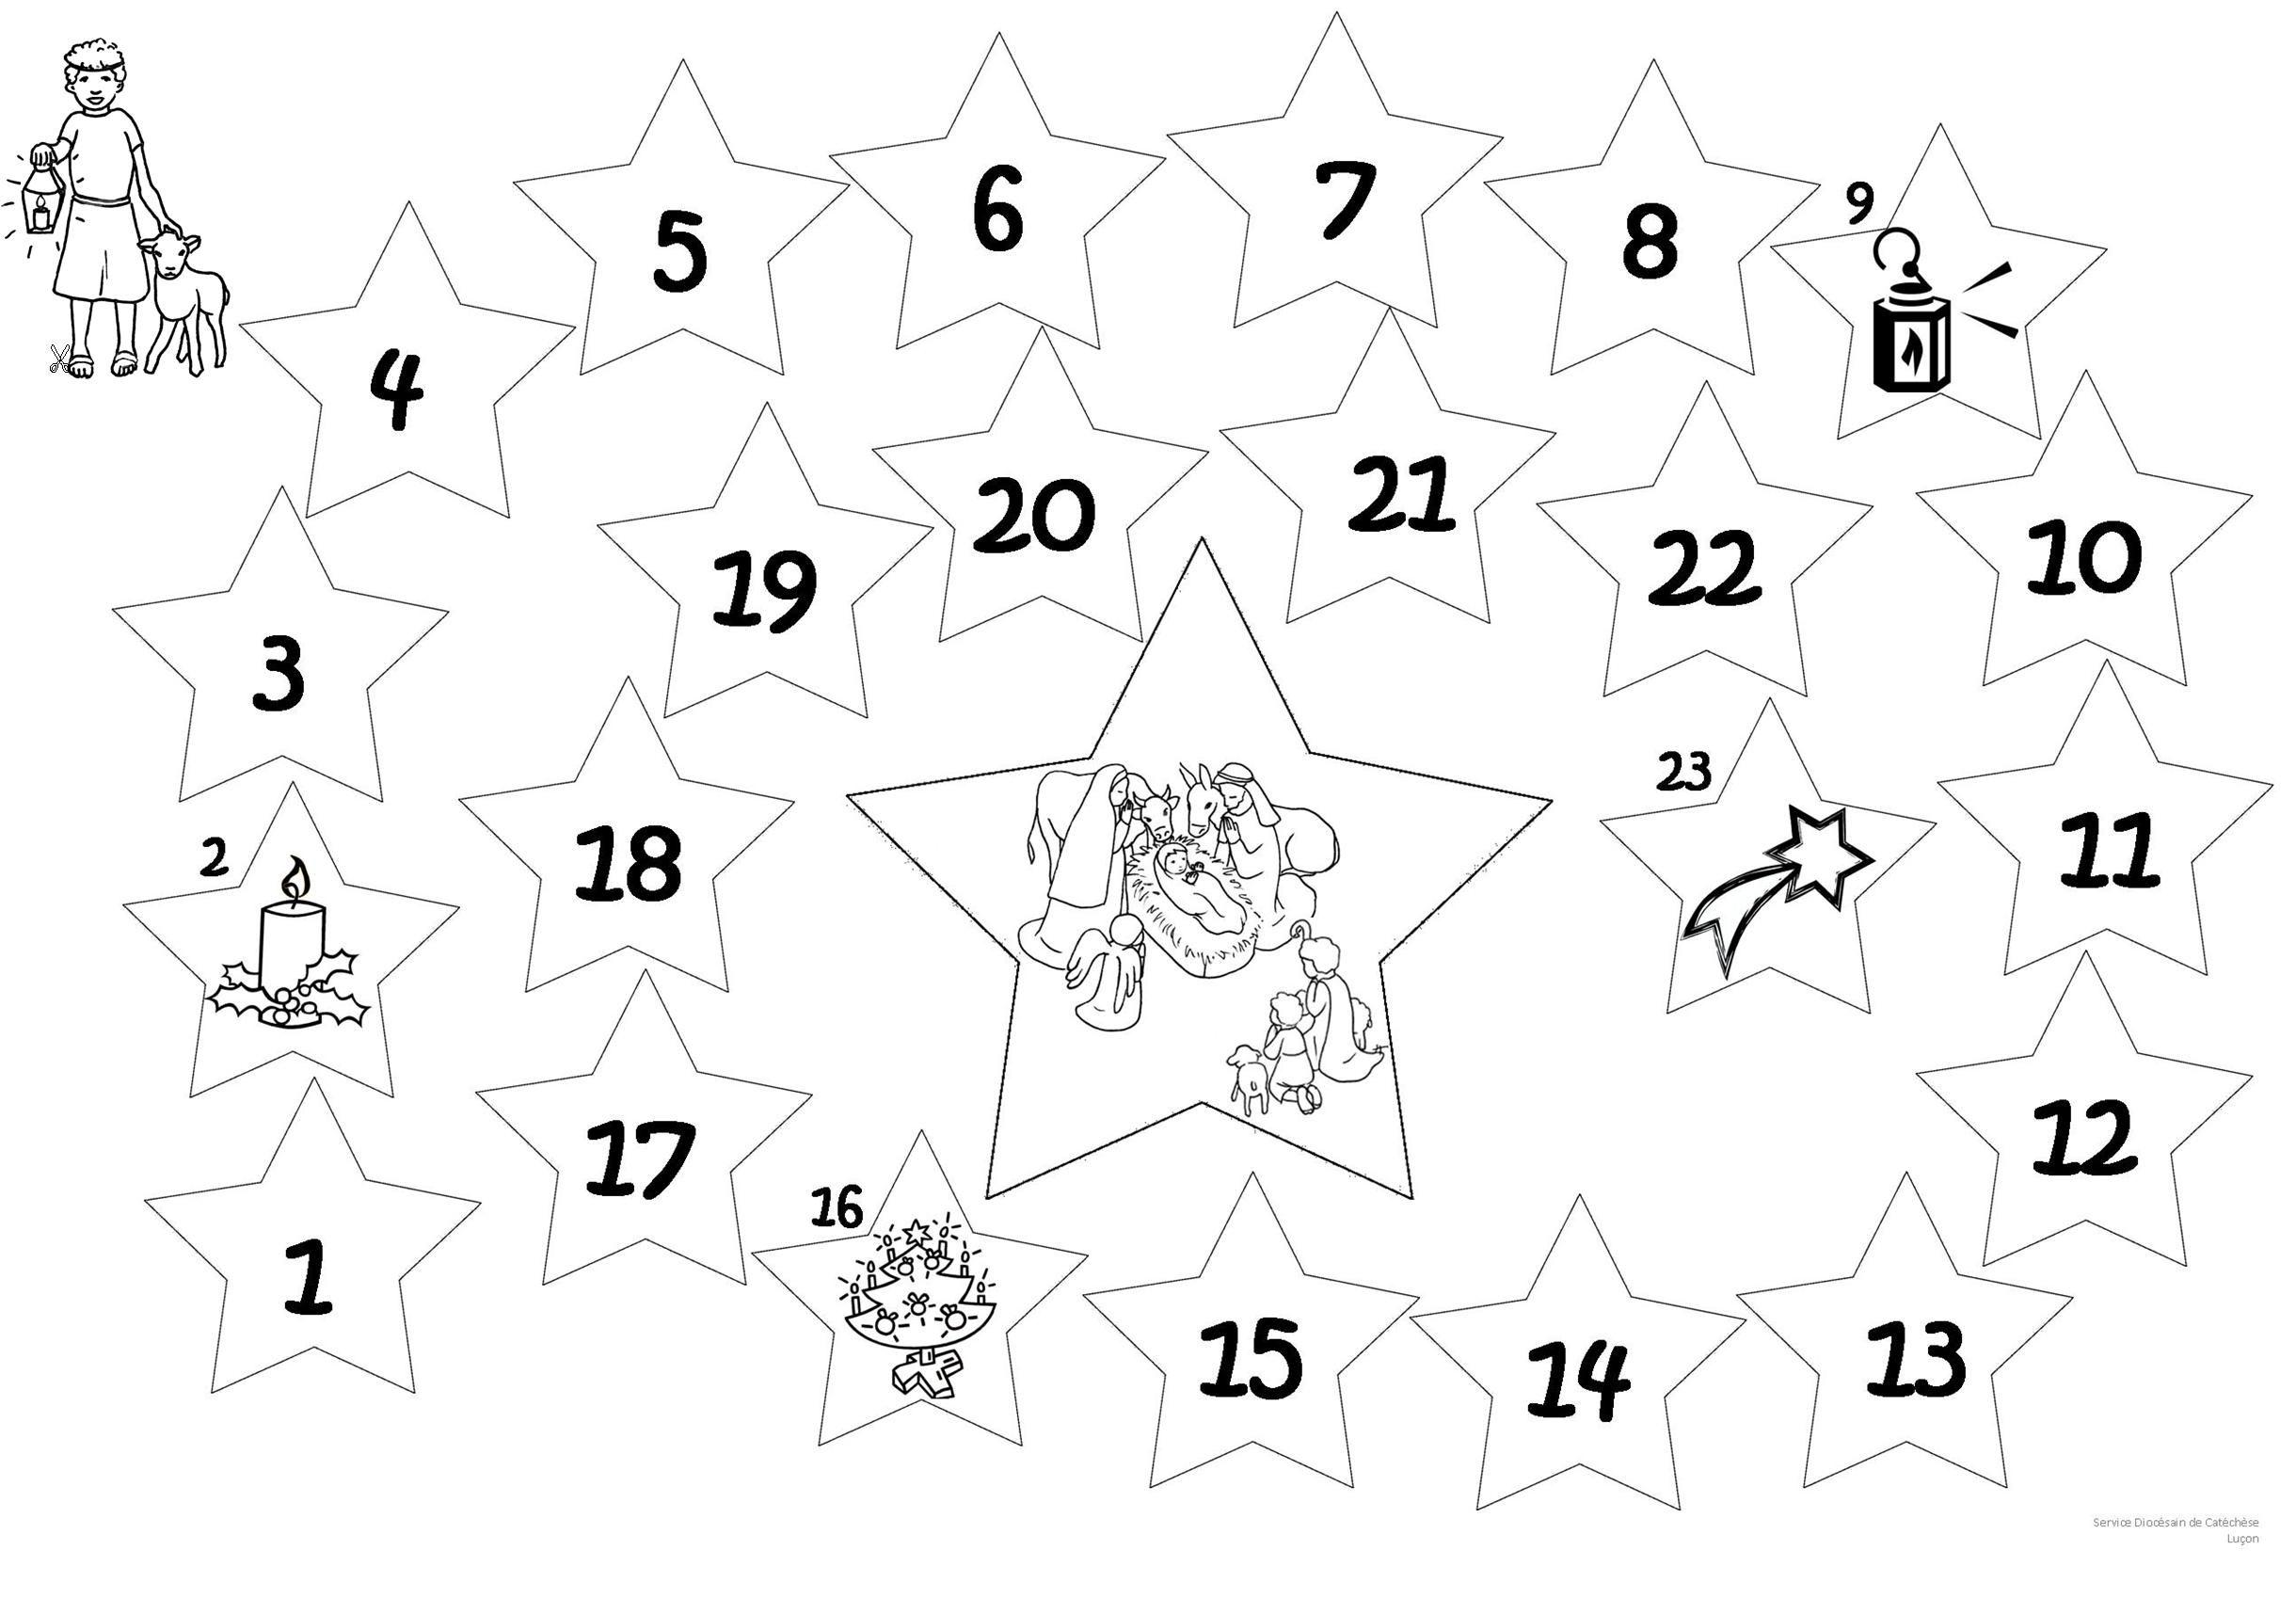 Advent Calendar Catholic Coloring Page Calendrier De L Avent Calendrier Idee Calendrier De L Avent [ 1715 x 2440 Pixel ]